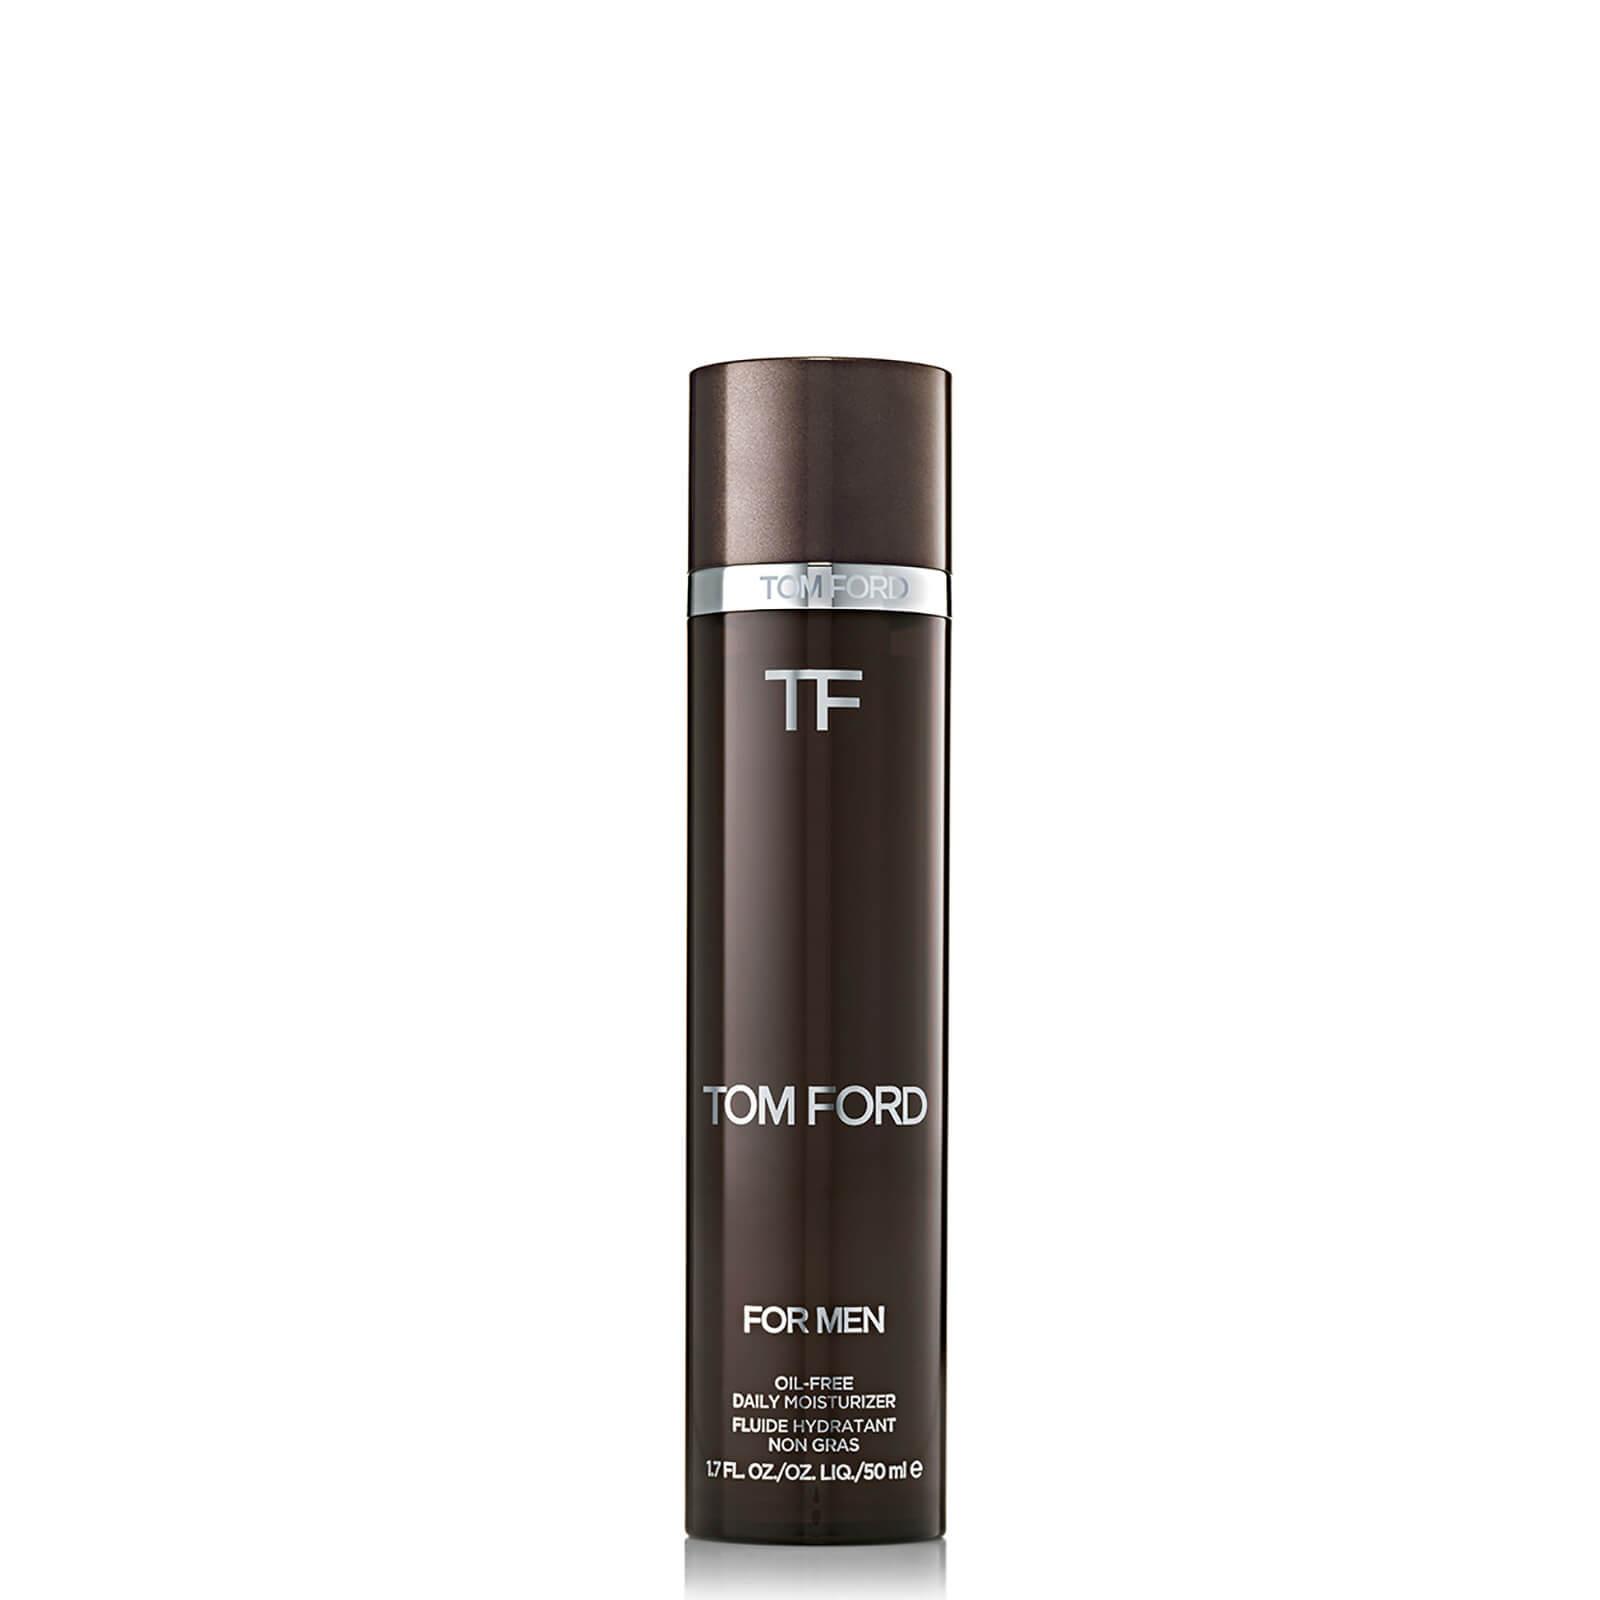 Tom Ford Oil-Free Daily Moisturizer 50ml